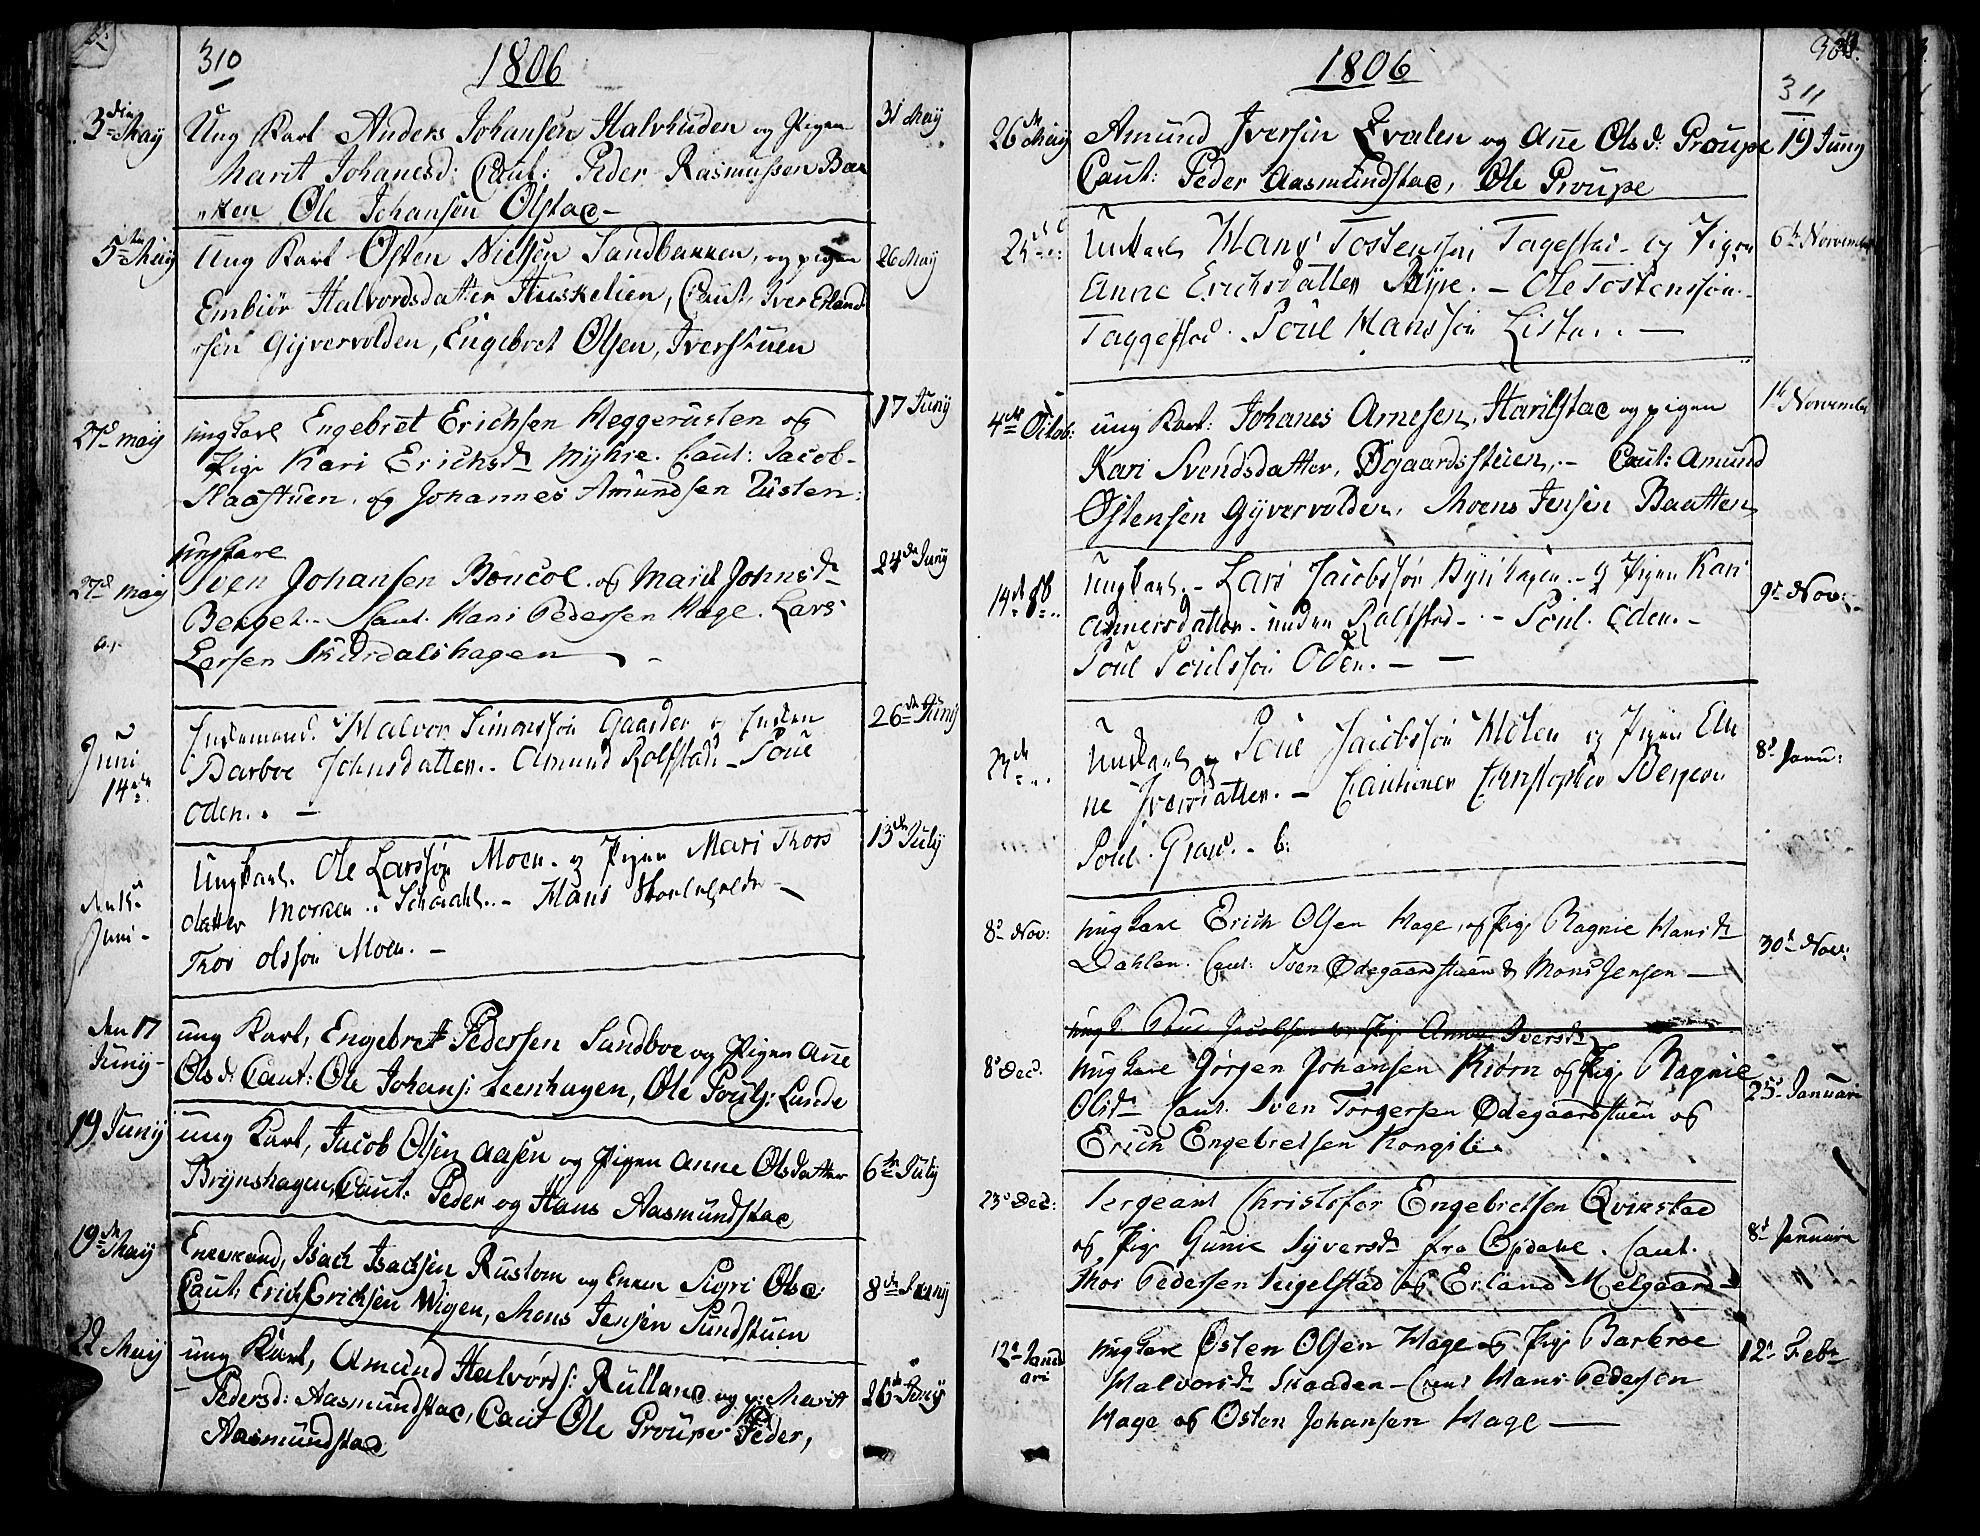 SAH, Fron prestekontor, H/Ha/Haa/L0001: Ministerialbok nr. 1, 1799-1816, s. 310-311